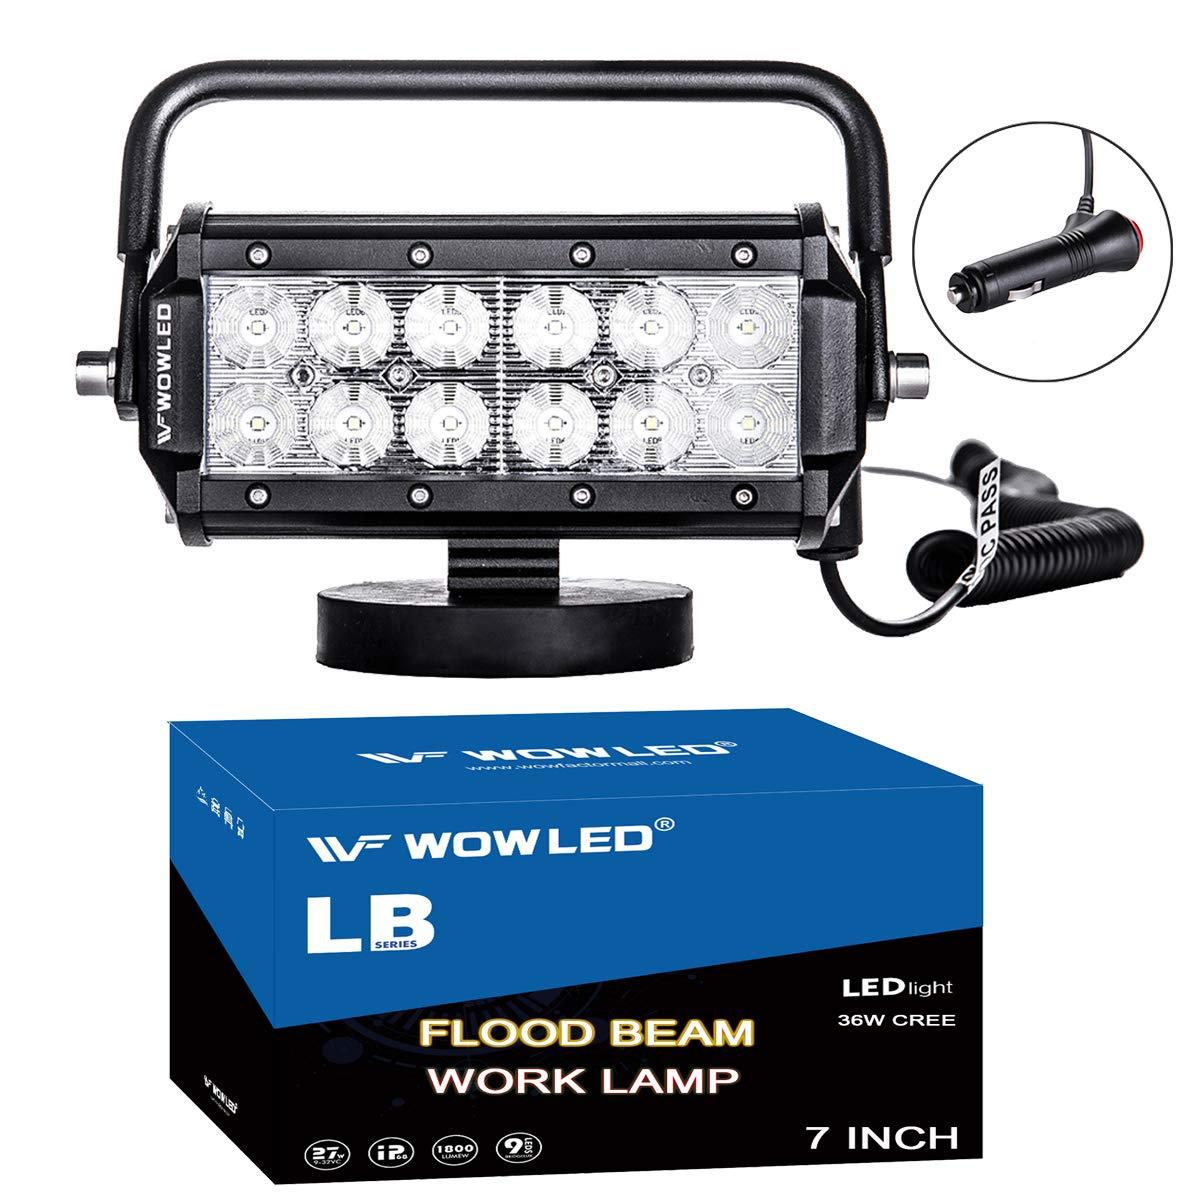 WOWLED 36W Floodlight LED Work Light Magnetic Base Mount Bracket Portable LED Light Bar Flood Beam Lamp for Car SUV Truck Boat Bar Jeep Off-Road Driving Lamp Fog Spot Lights by WOWLED